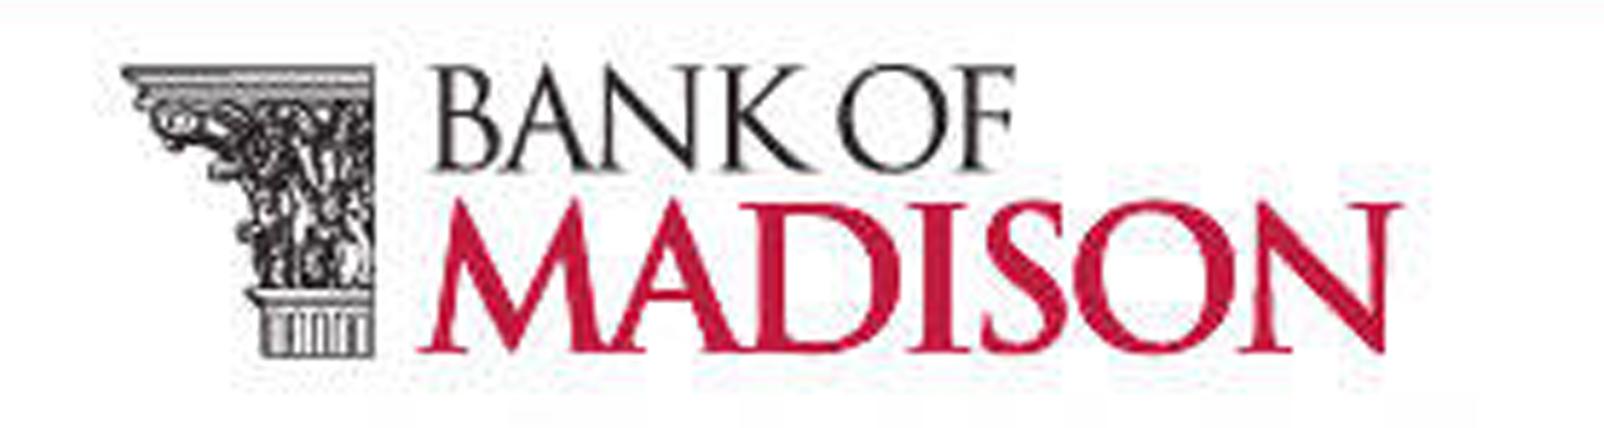 Bank of Madison